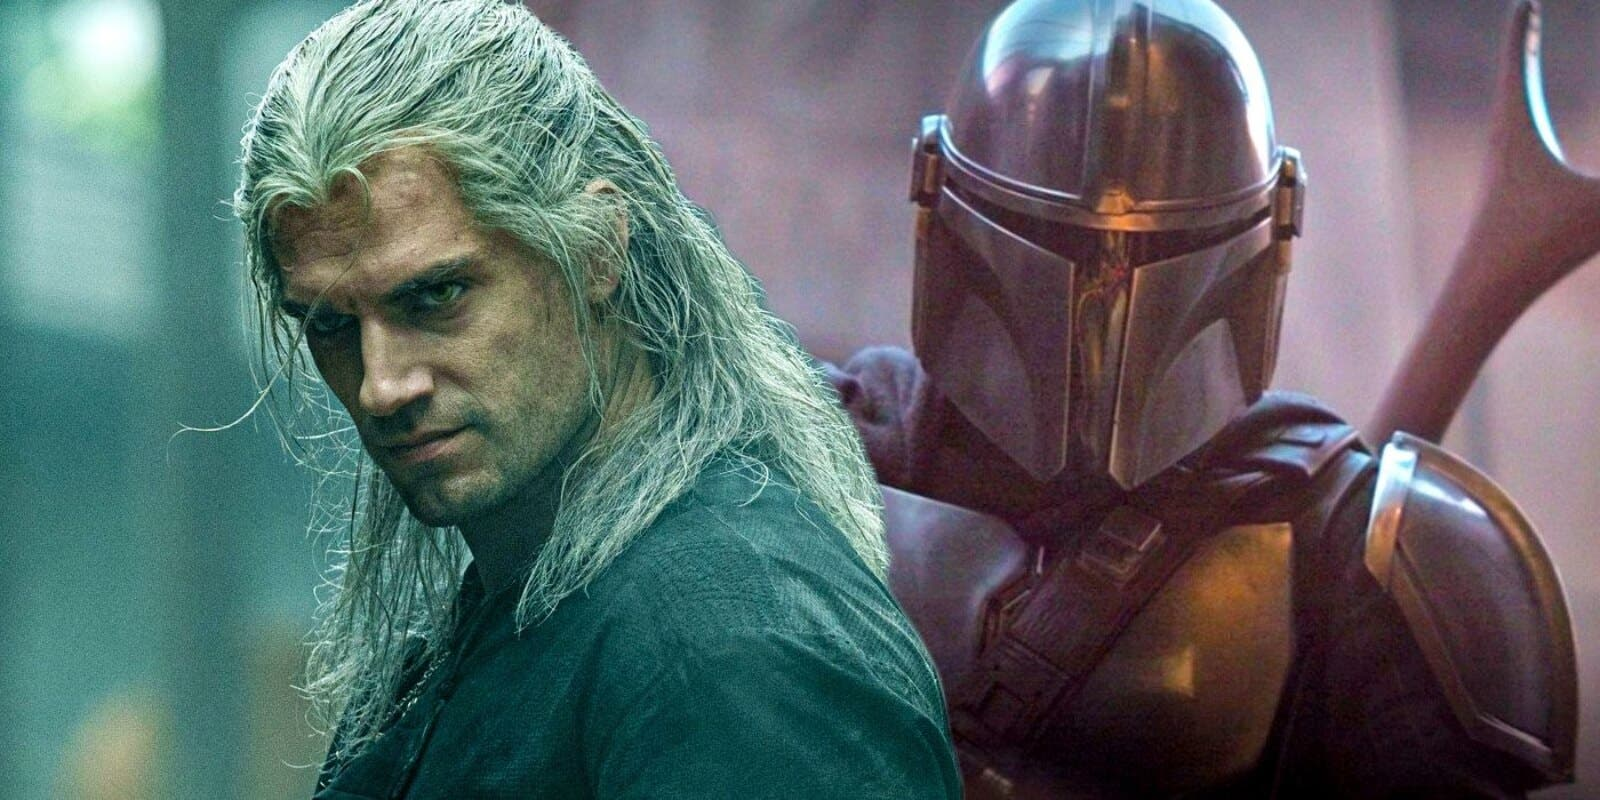 La serie de The Witcher en Netflix sigue siendo mucho más demanda que The Mandalorian de Disney+